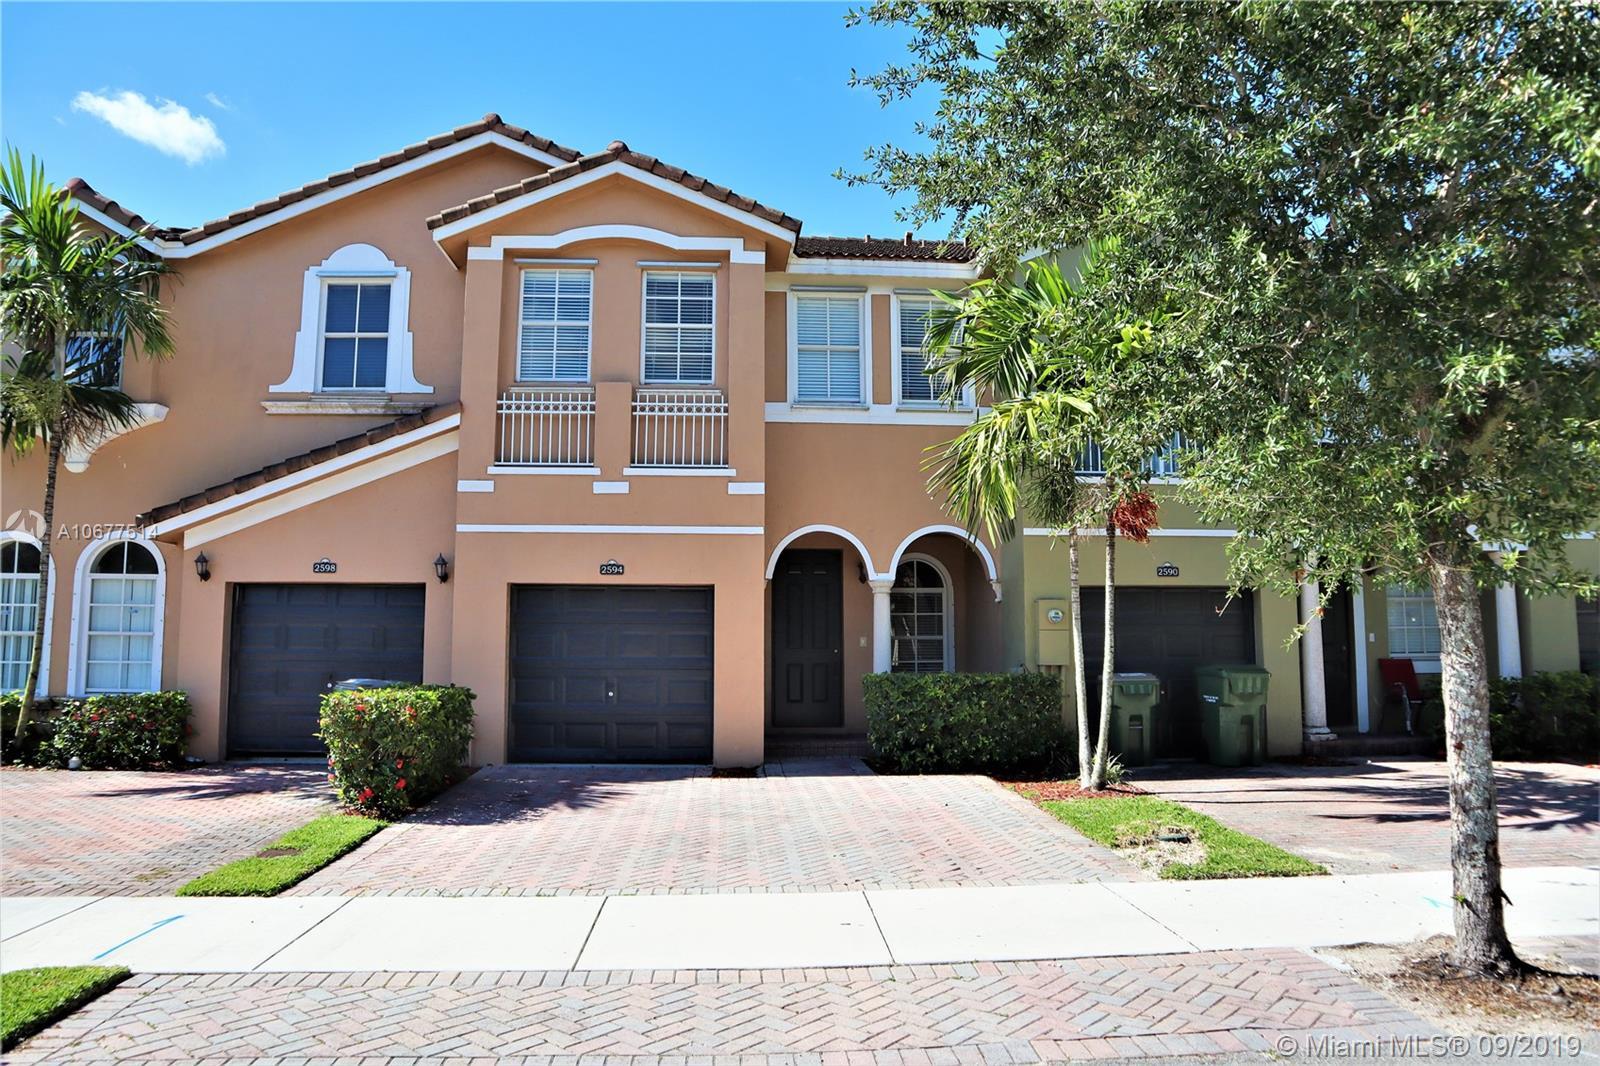 2594 SE 14 St, Homestead, FL 33035 - Homestead, FL real estate listing